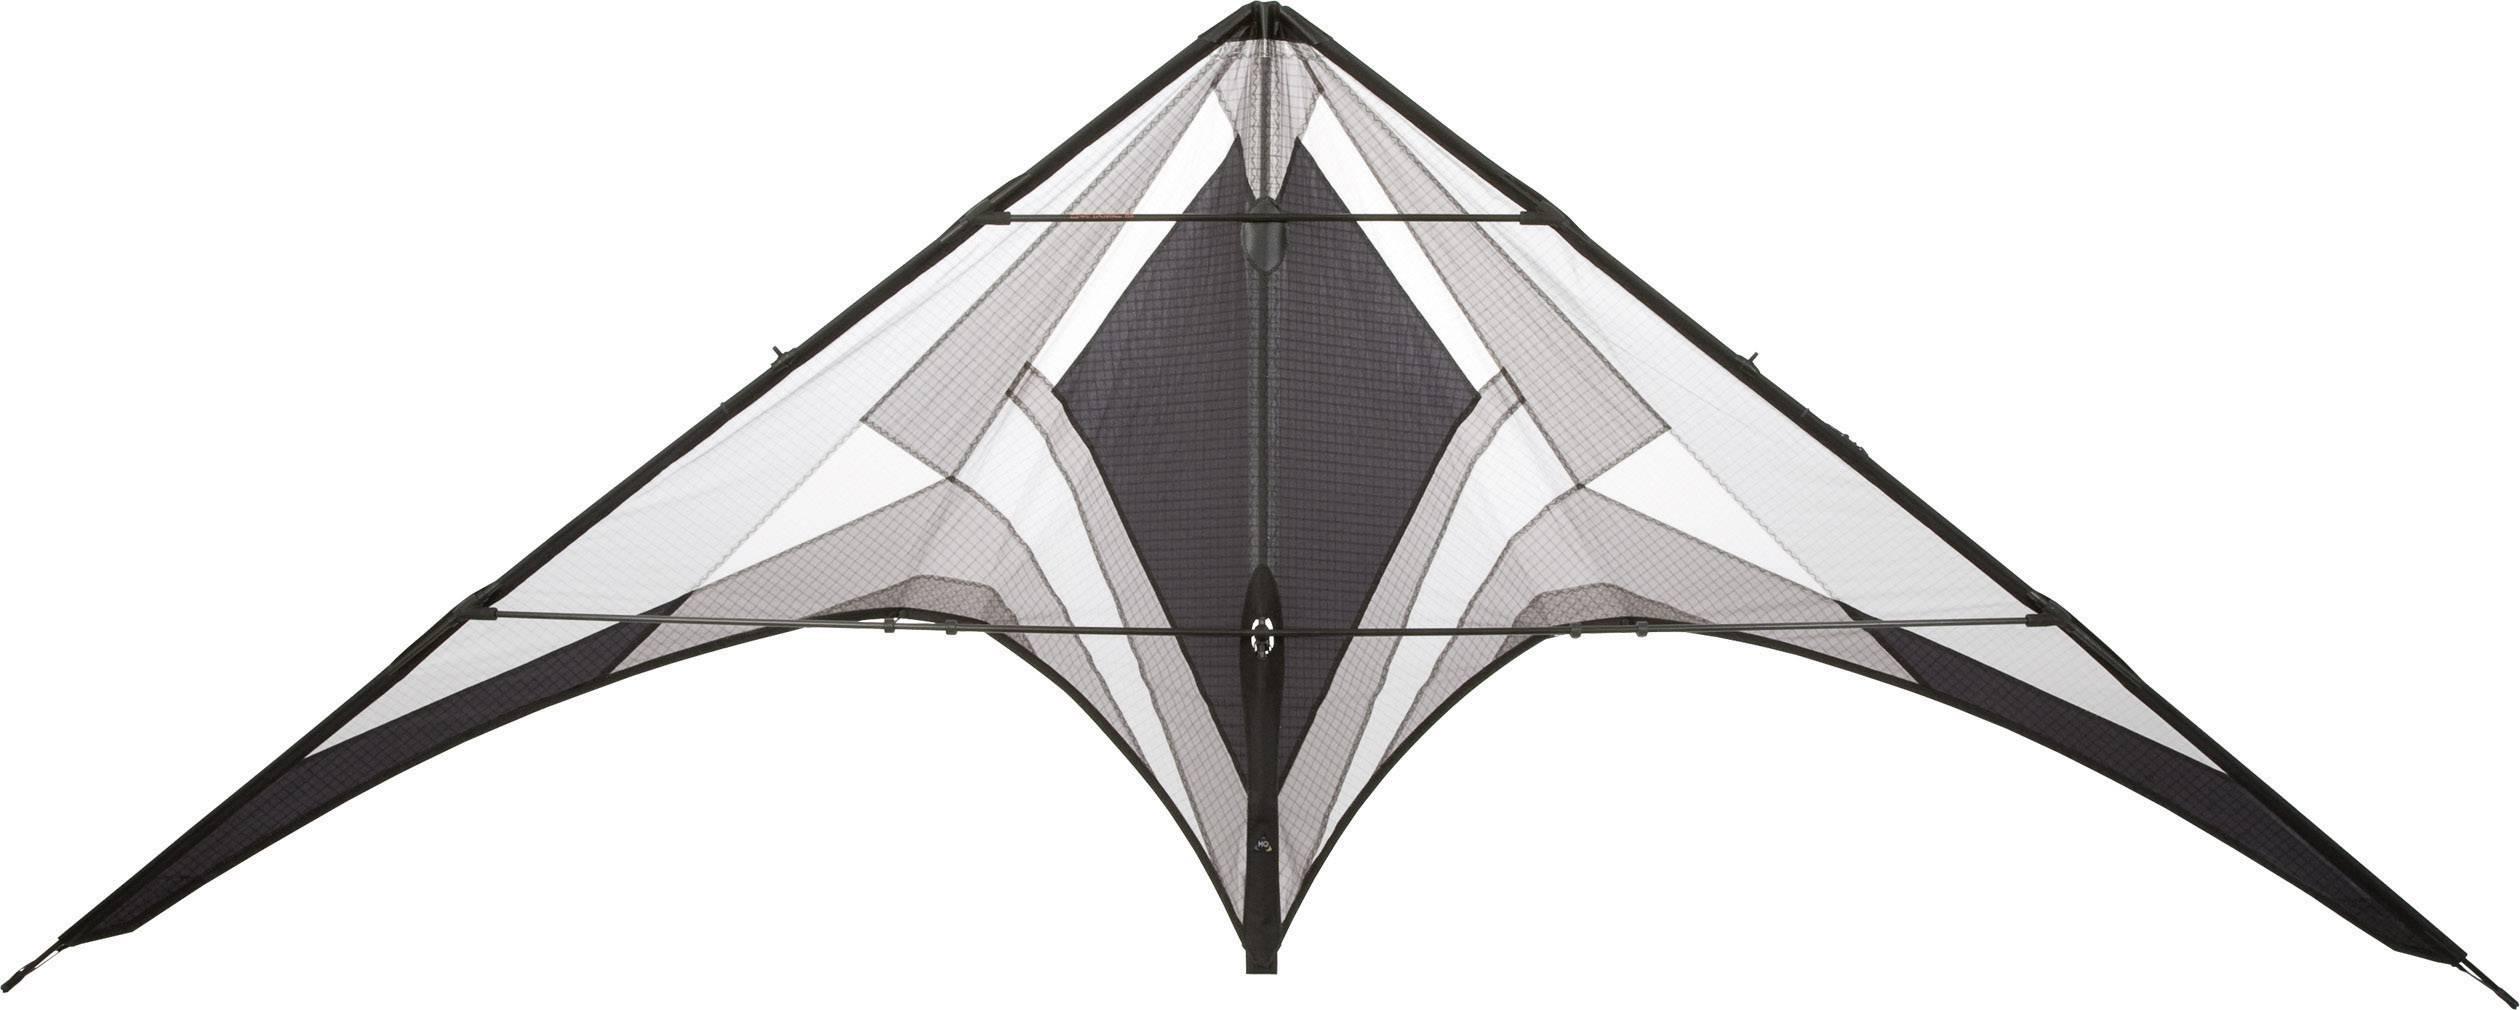 Športový šarkan HQ Infinity 117366, rozpätie 2460 mm